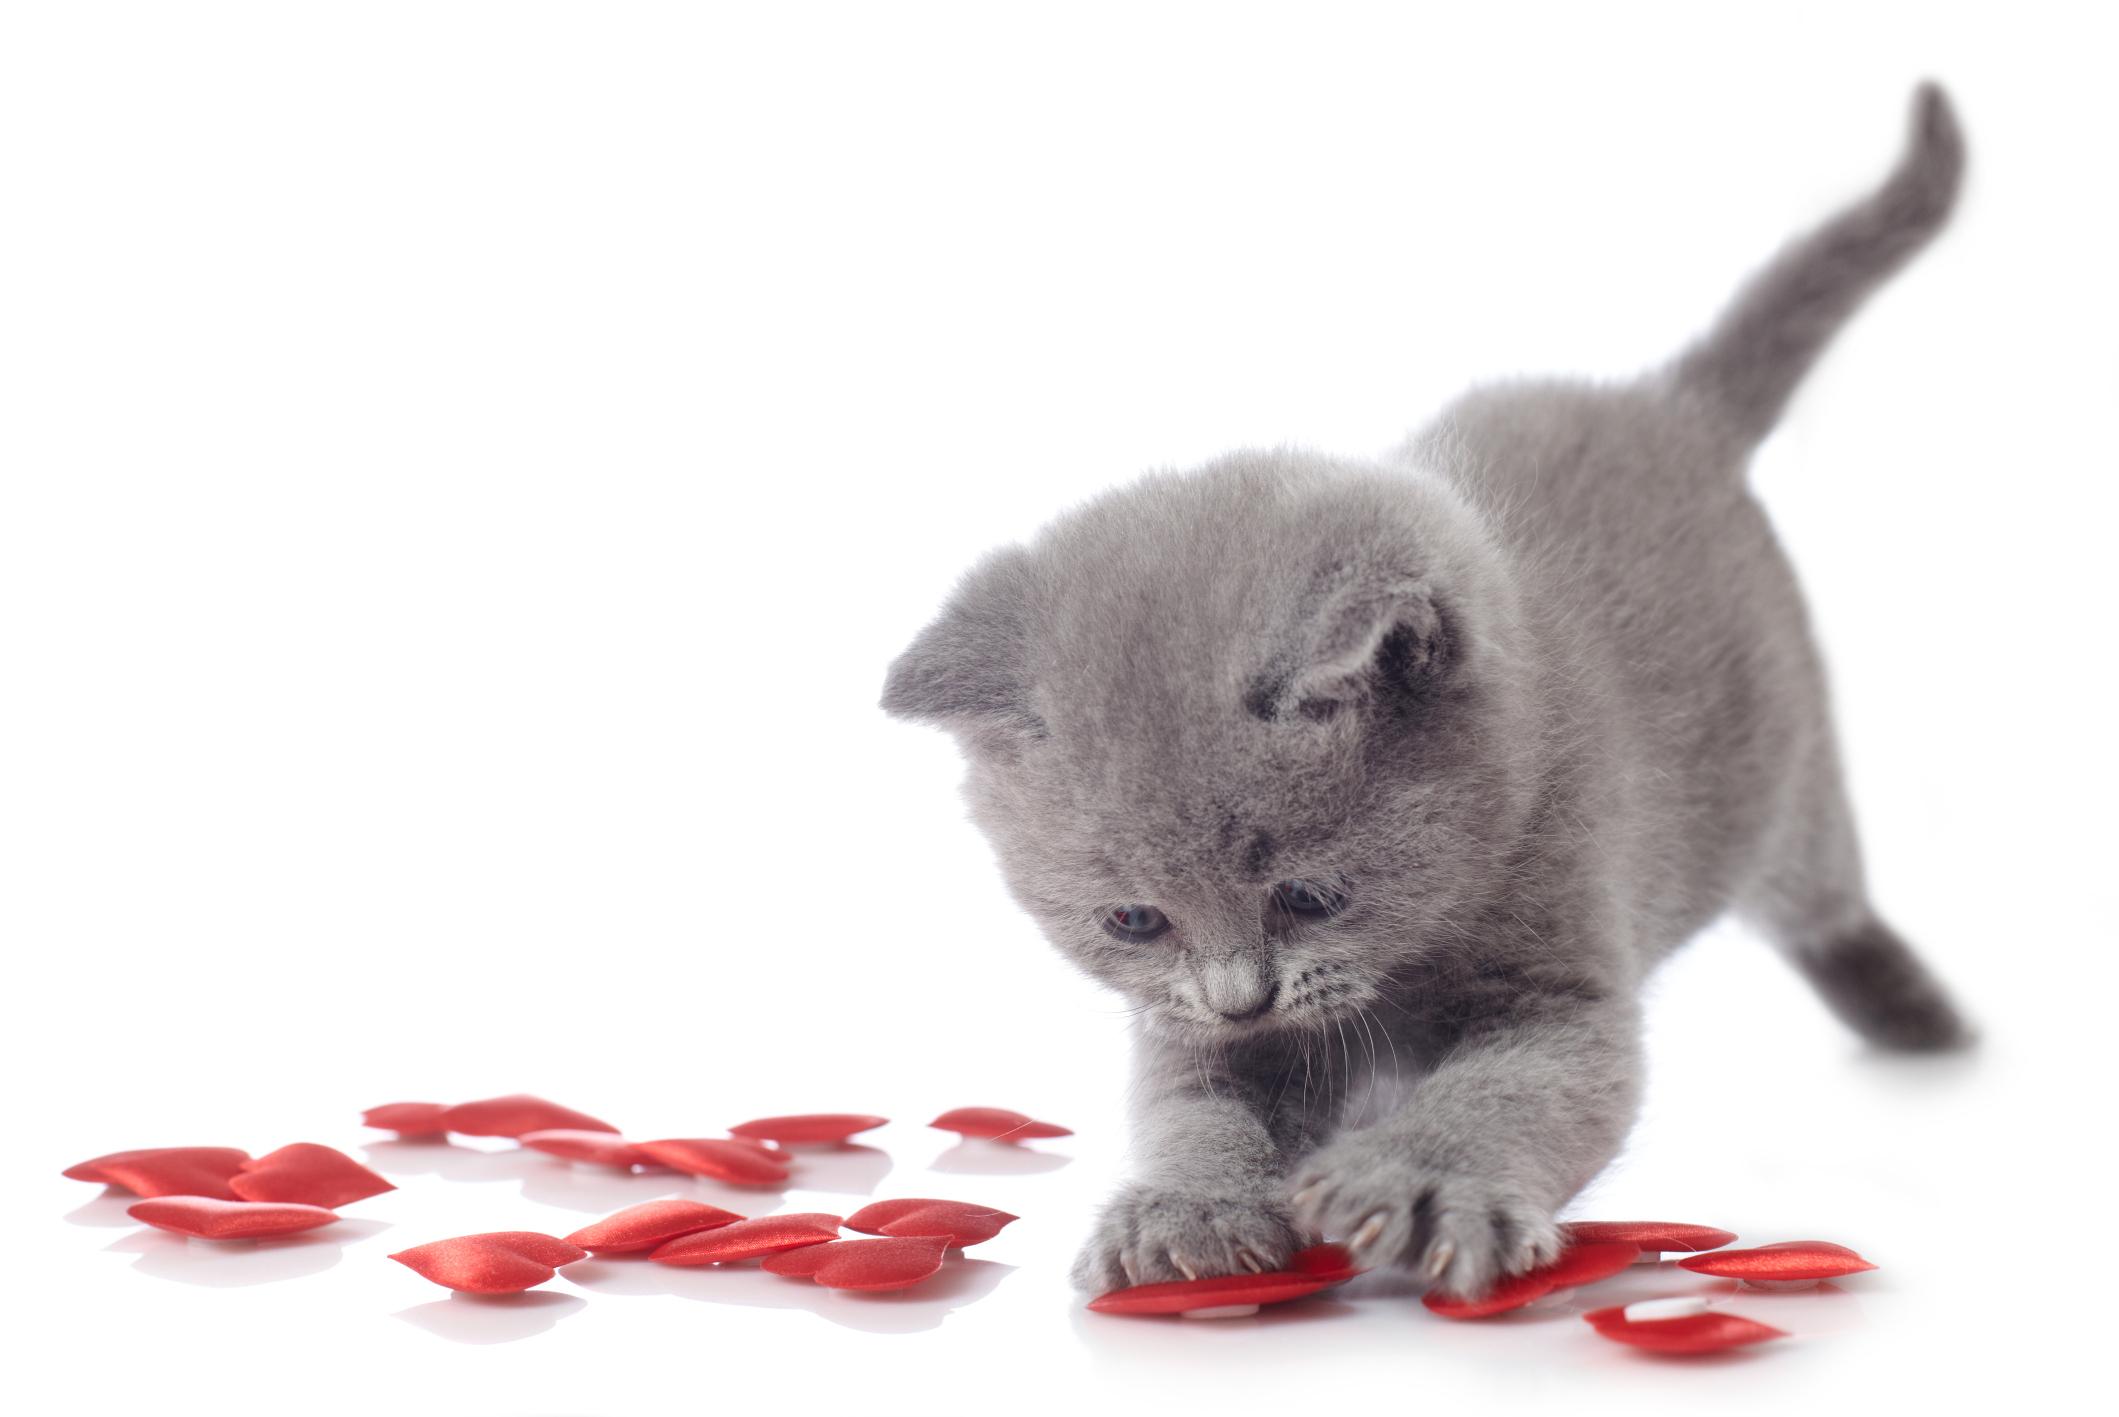 Cat Valentines Day Wwwpixsharkcom Images Galleries